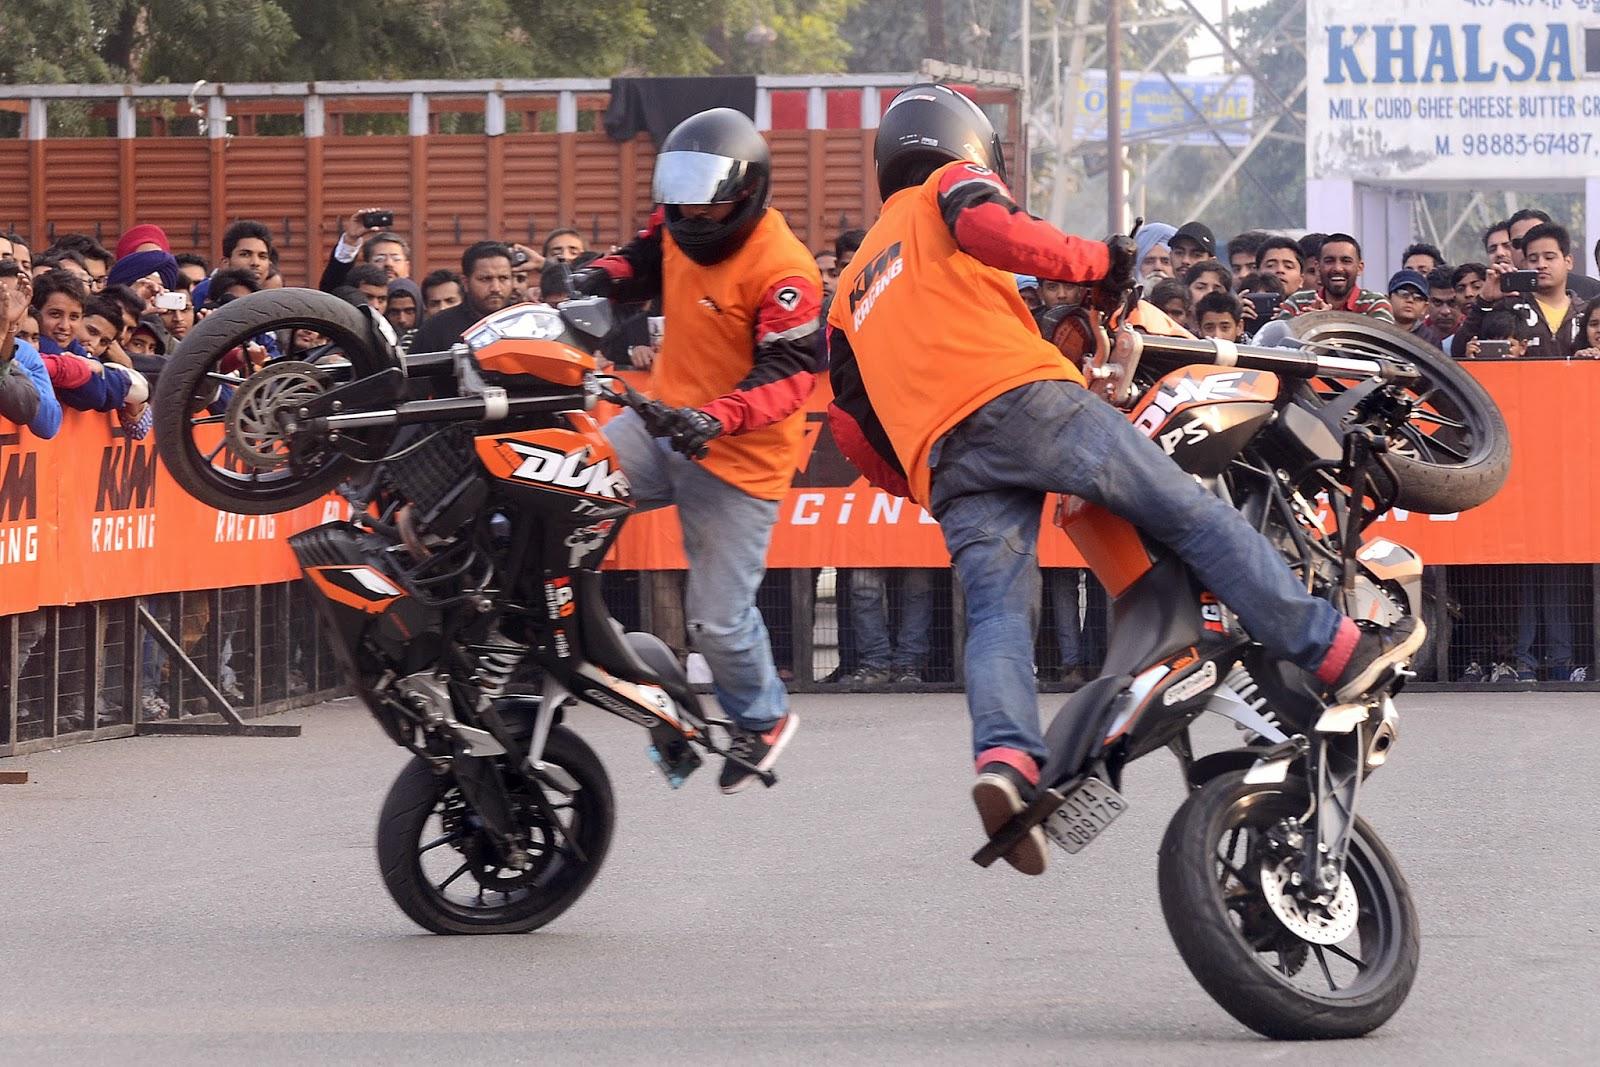 KTM, India, Show, Art, Motor bike, Australia, Sports motorcycle, Manufacture, Stunt, Perform, Offbeat, Stuntmen, Amritsar,